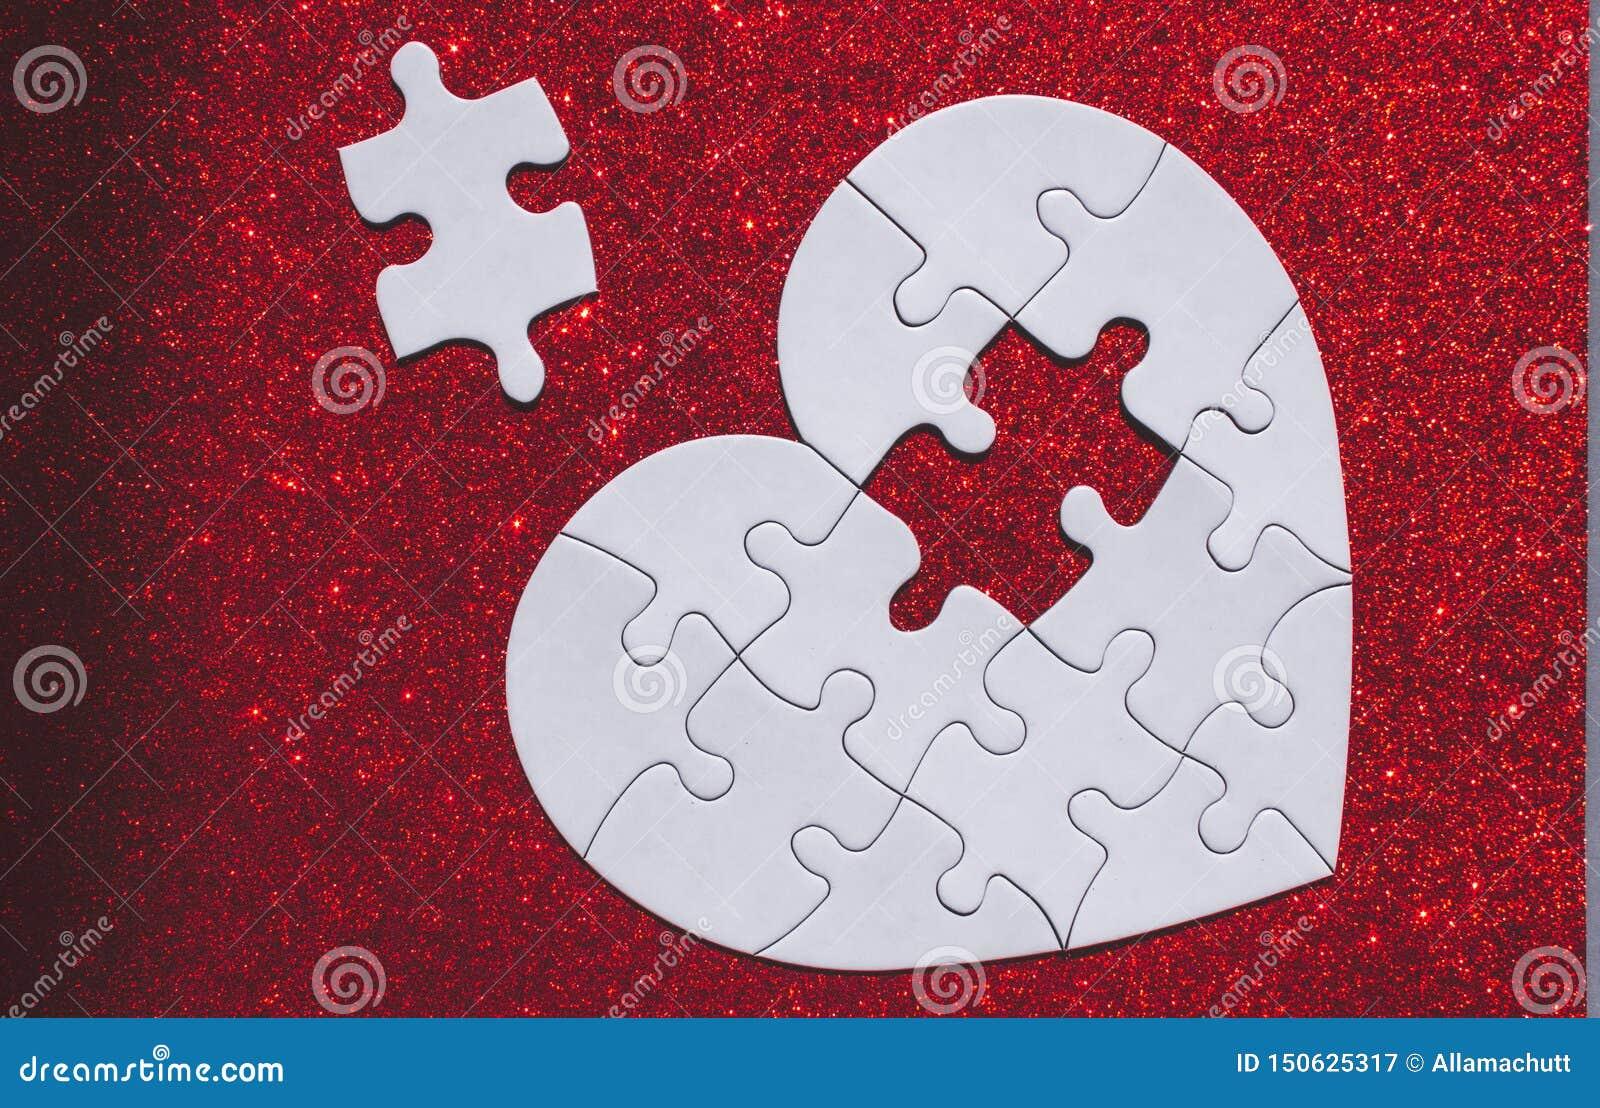 Wit hart gevormd raadsel op rode fonkelingsachtergrond